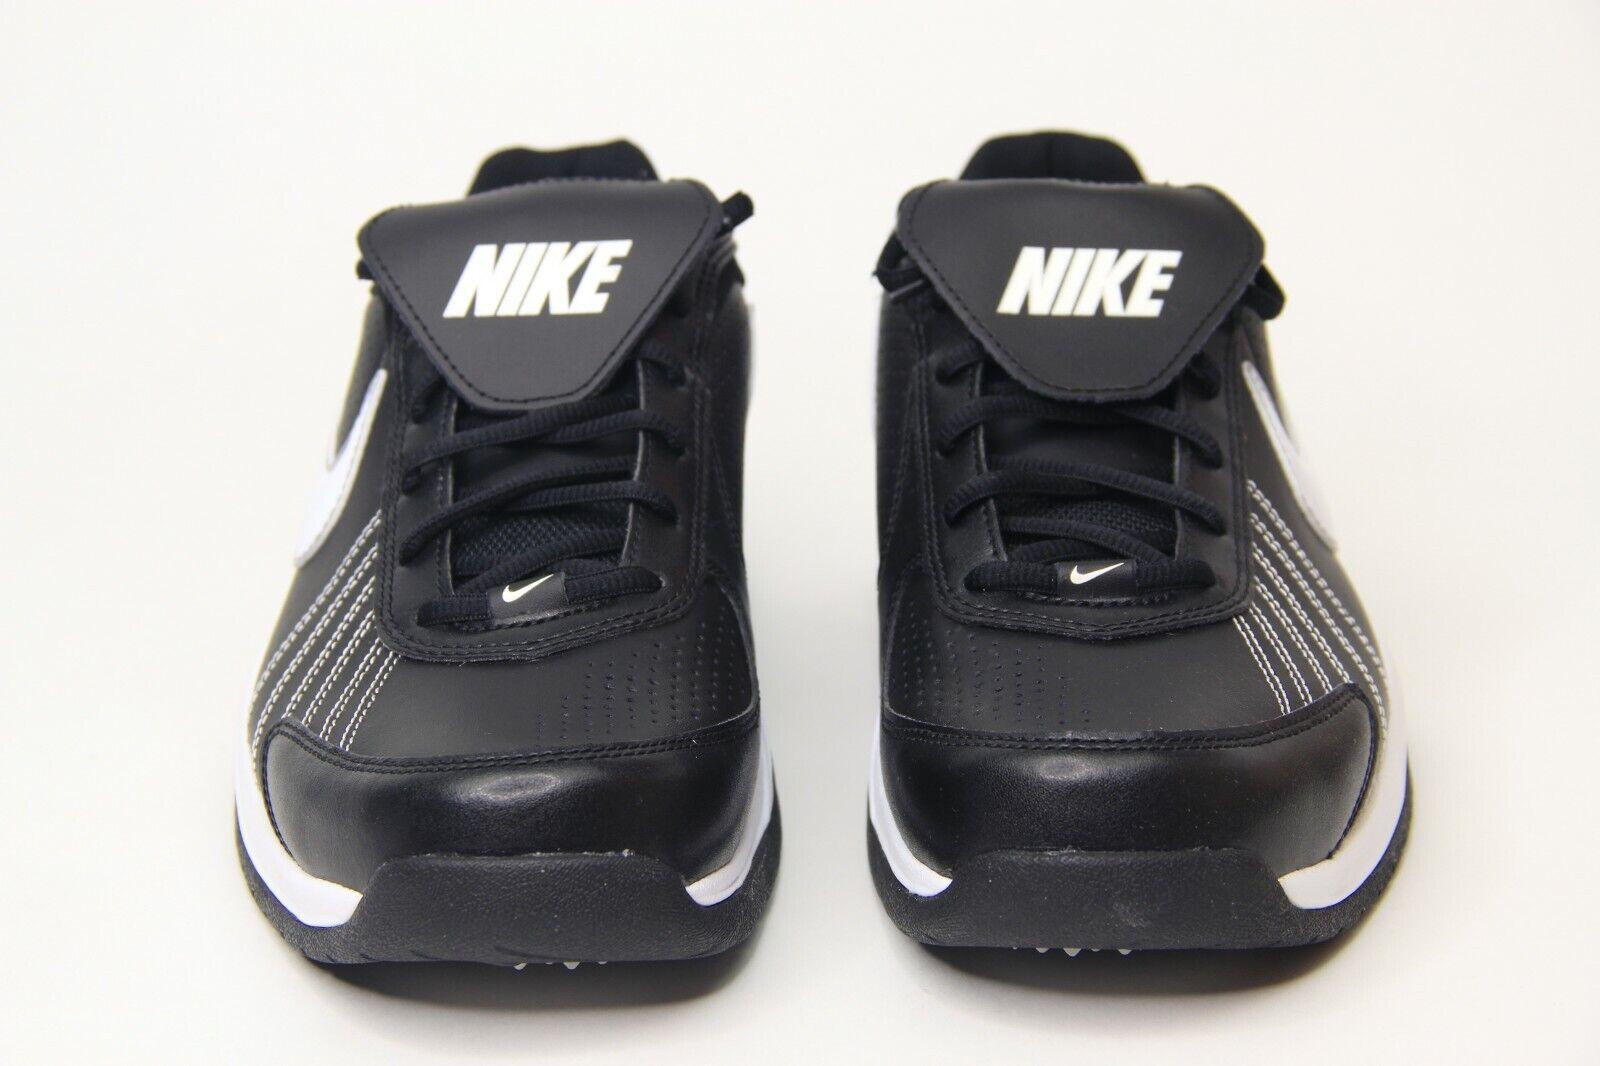 Nike Air Diamond Baseball Trainer Turf shoes Black White 333785-012 Men SZ New